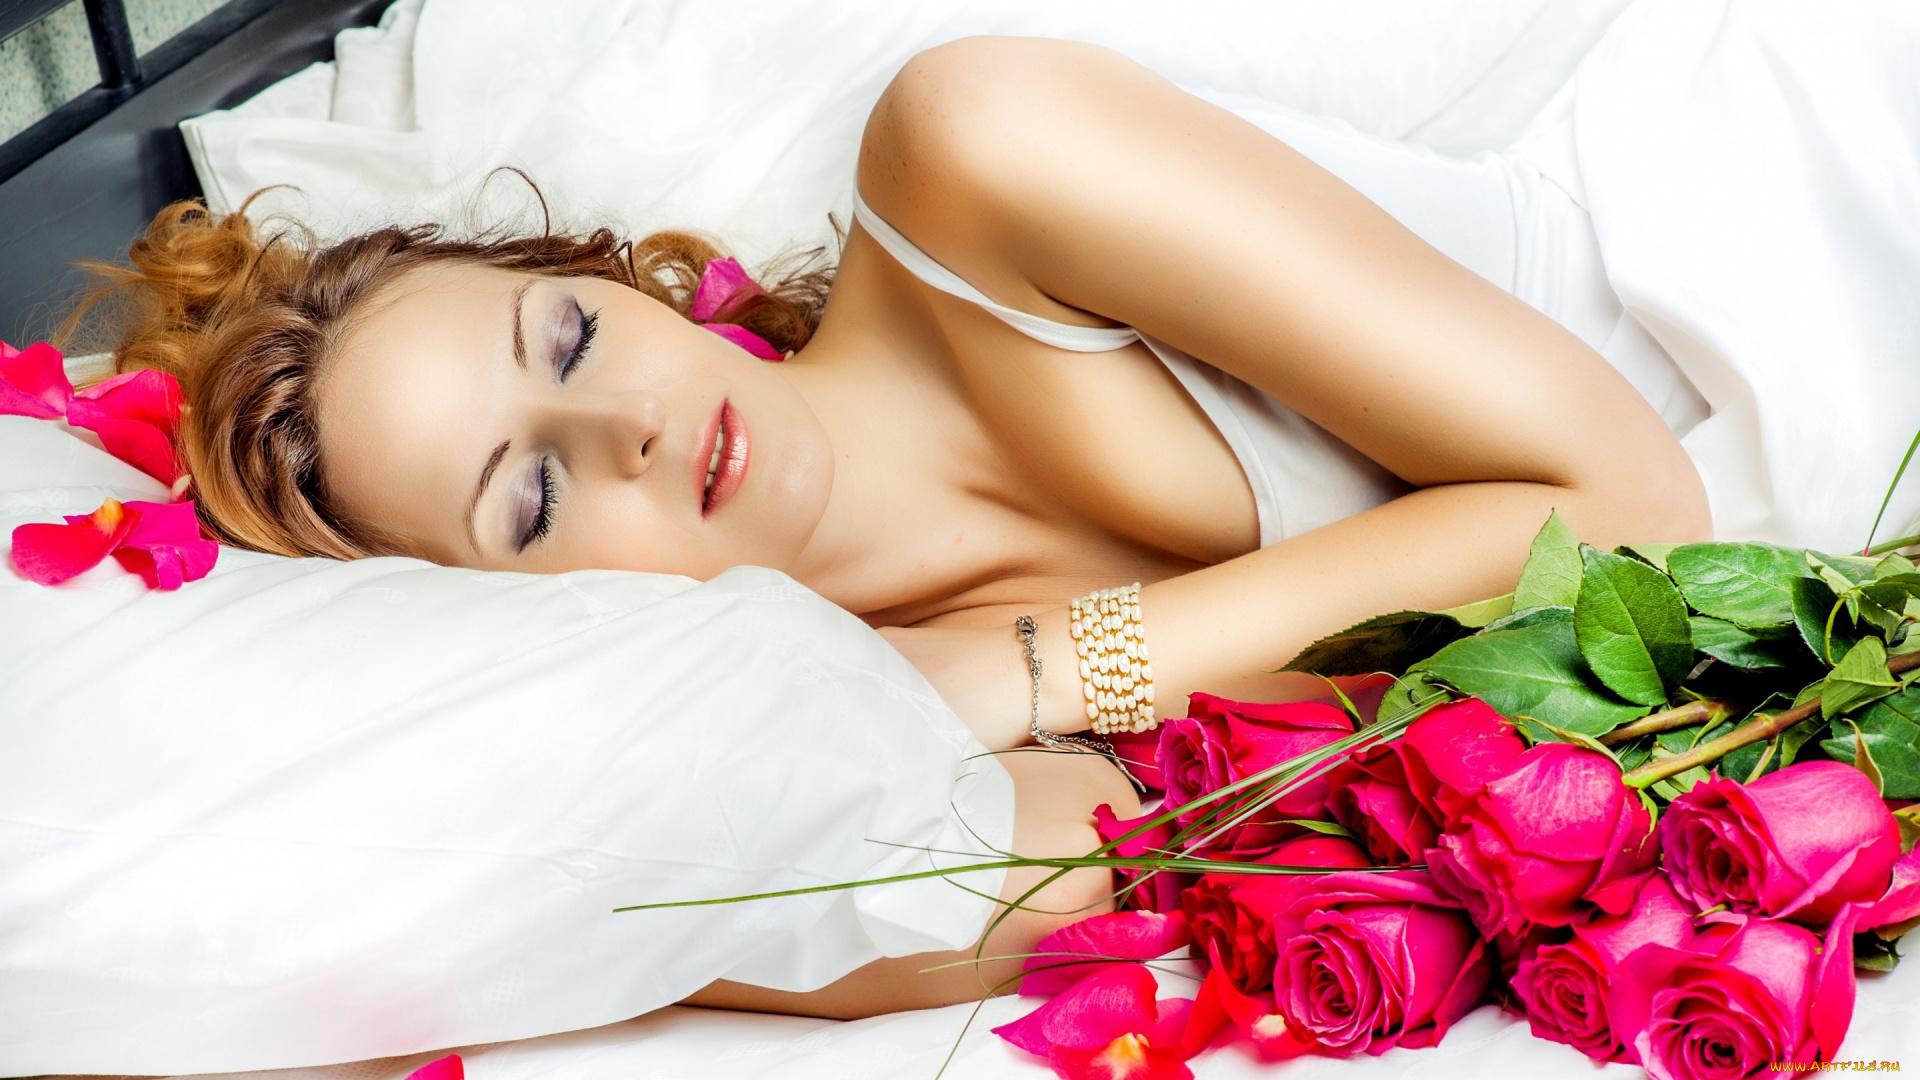 Фото девушек с розами на кроватей